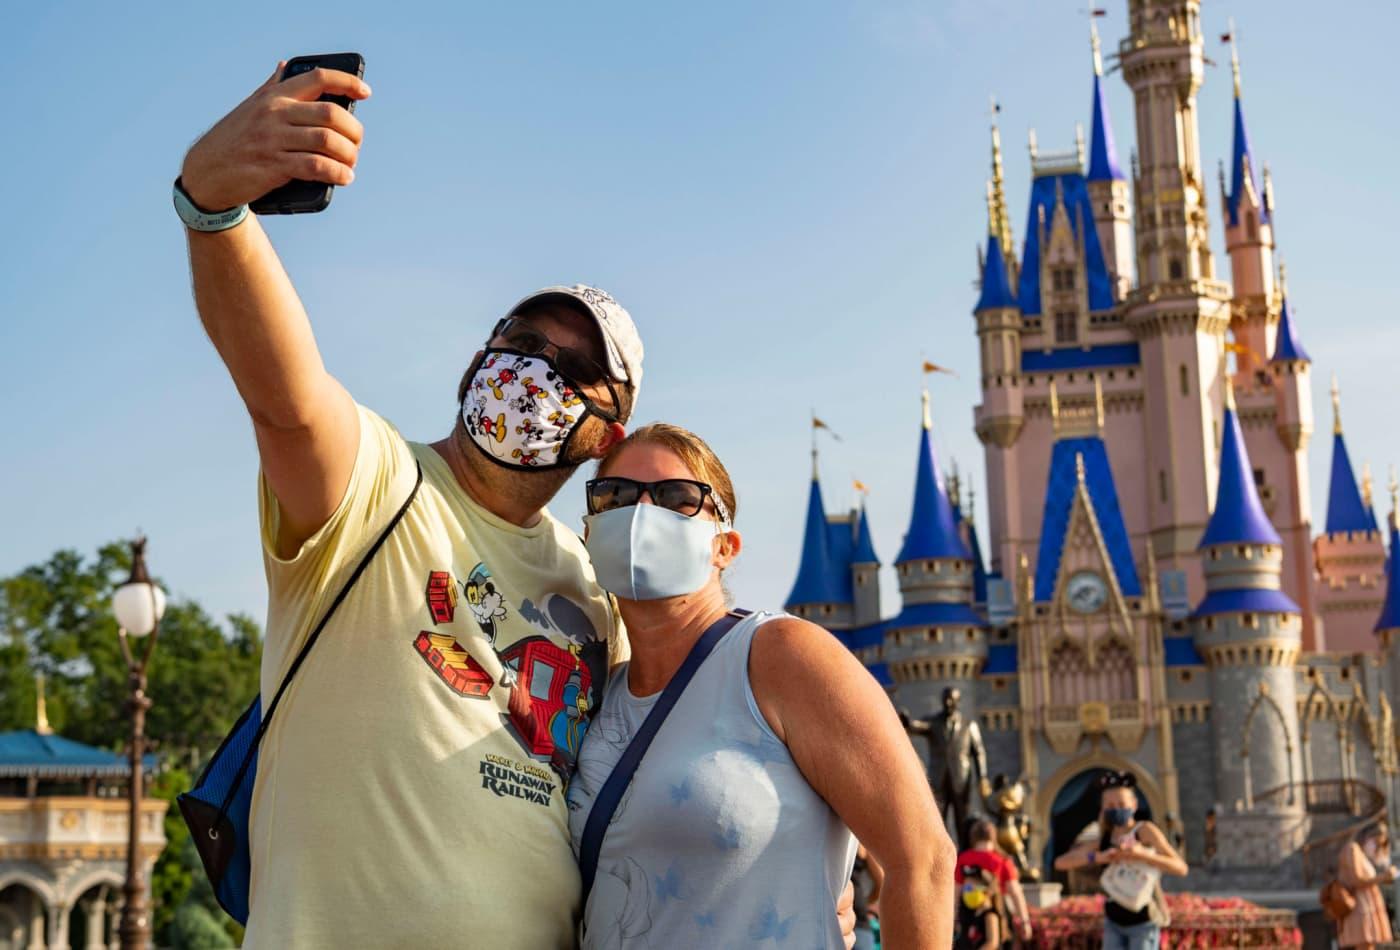 Disney to lay off 28,000 employees as coronavirus slams its theme park business